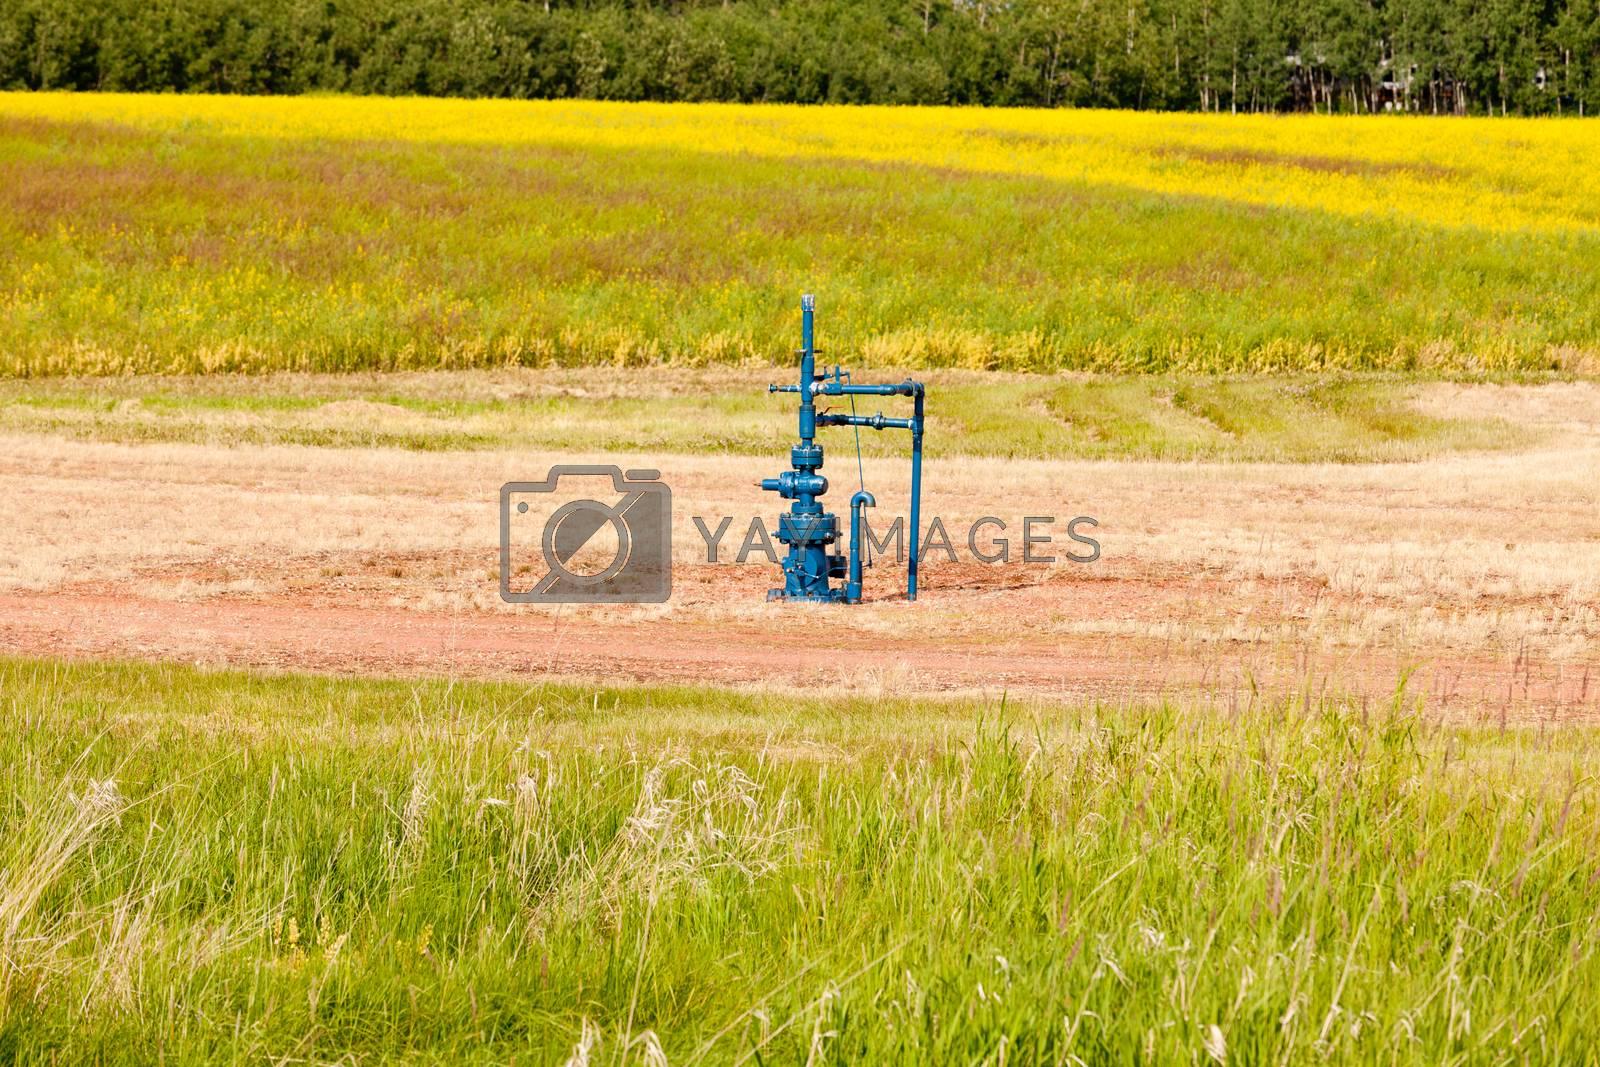 Natural gas wellhead Alberta Canada grassland by PiLens